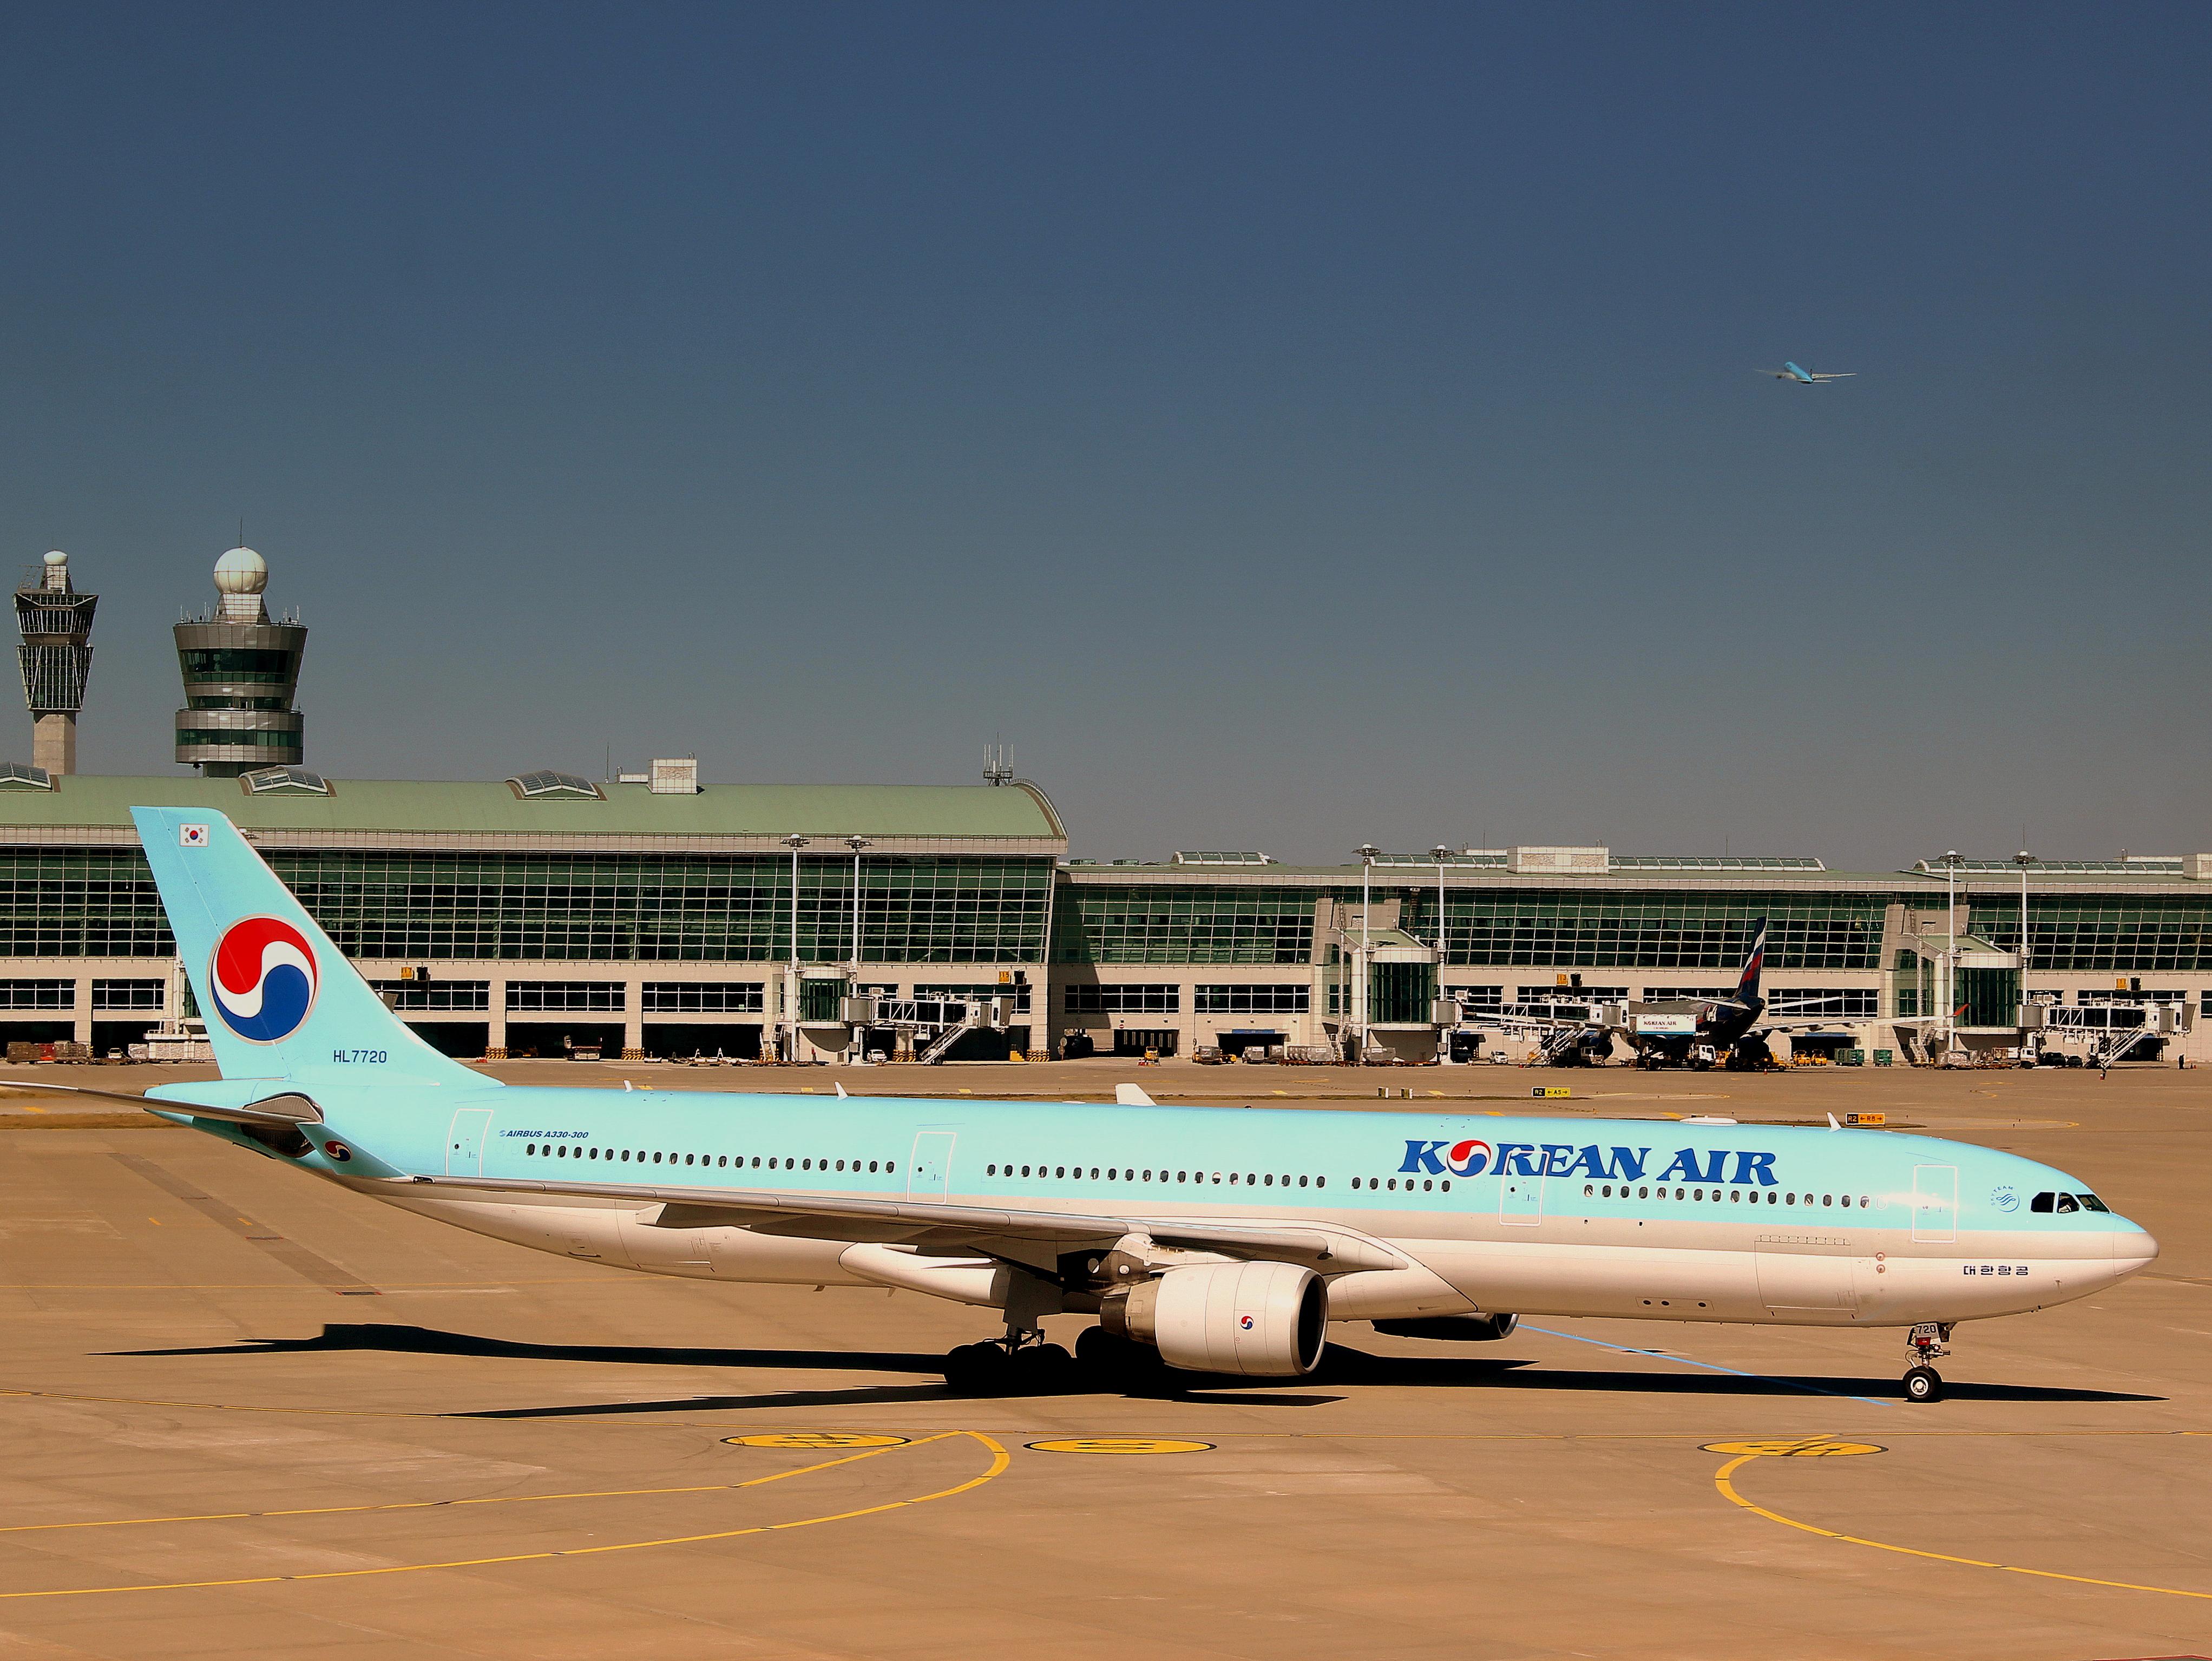 south korea airport 2 - photo #29